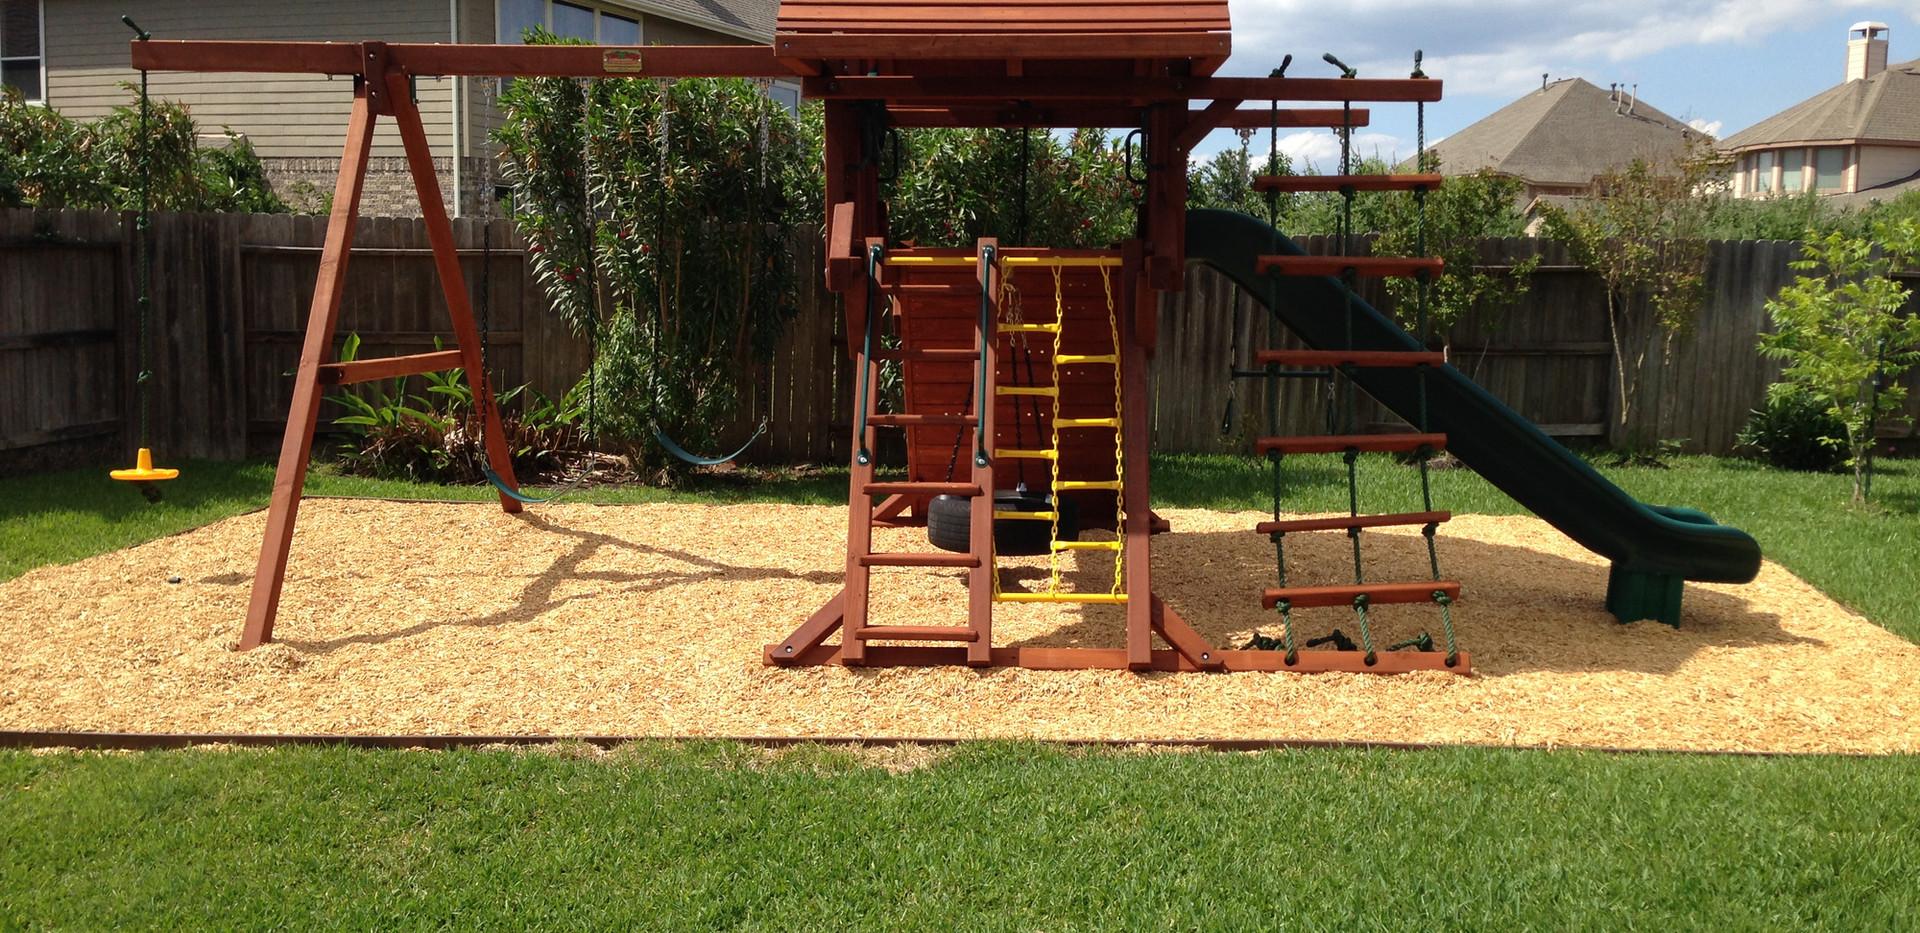 Playground Set Up